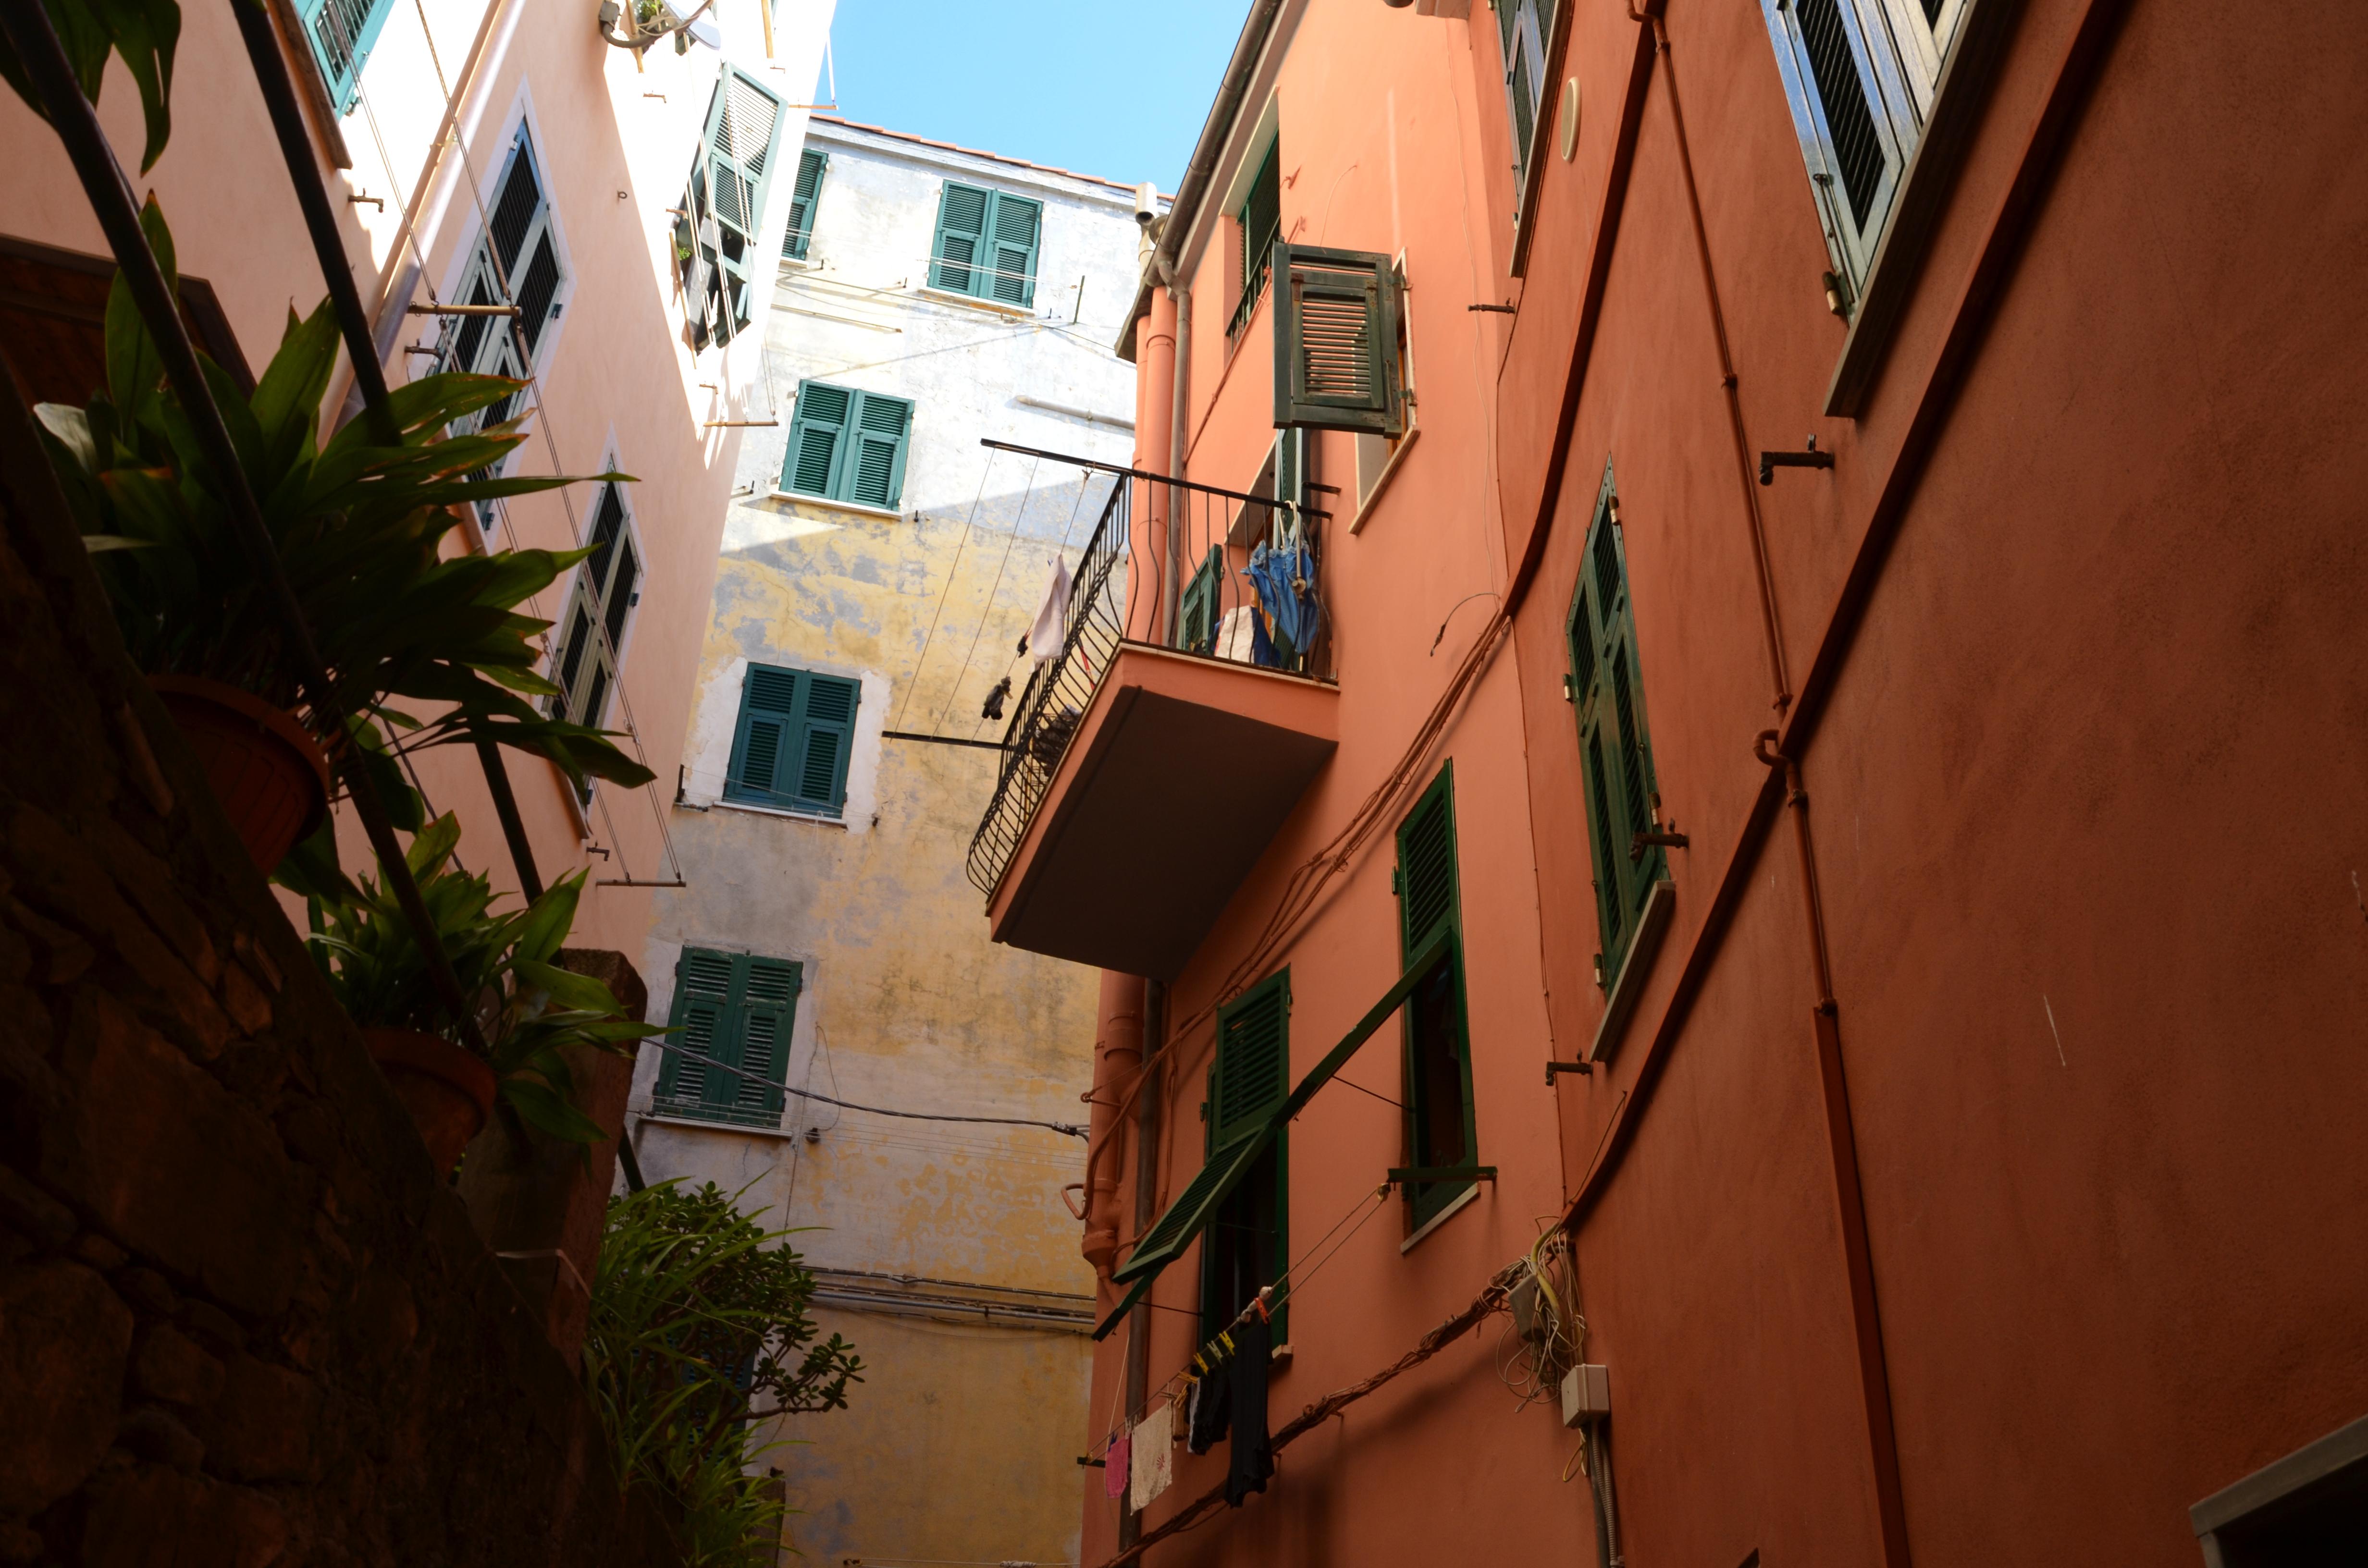 riomaggiore italie cinque terre ruelles